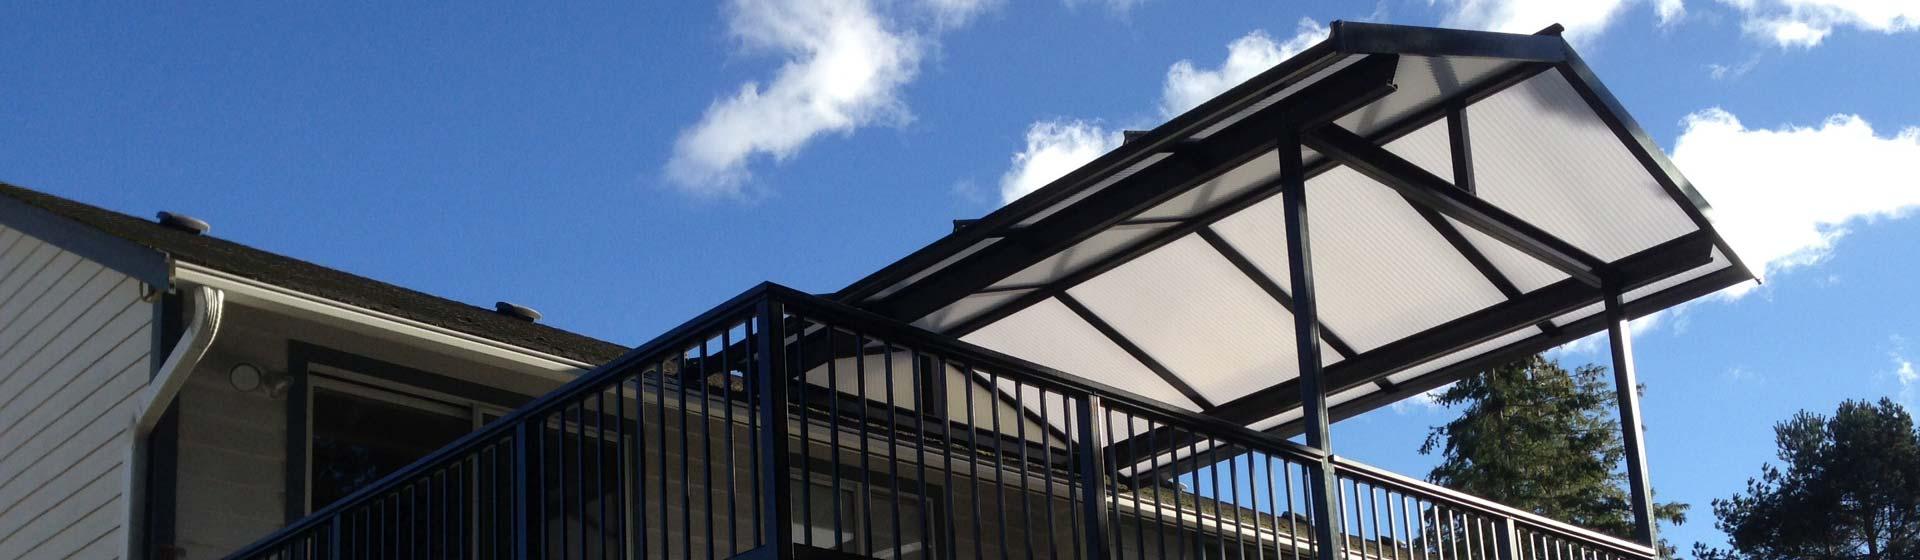 acrylic-patio-covers